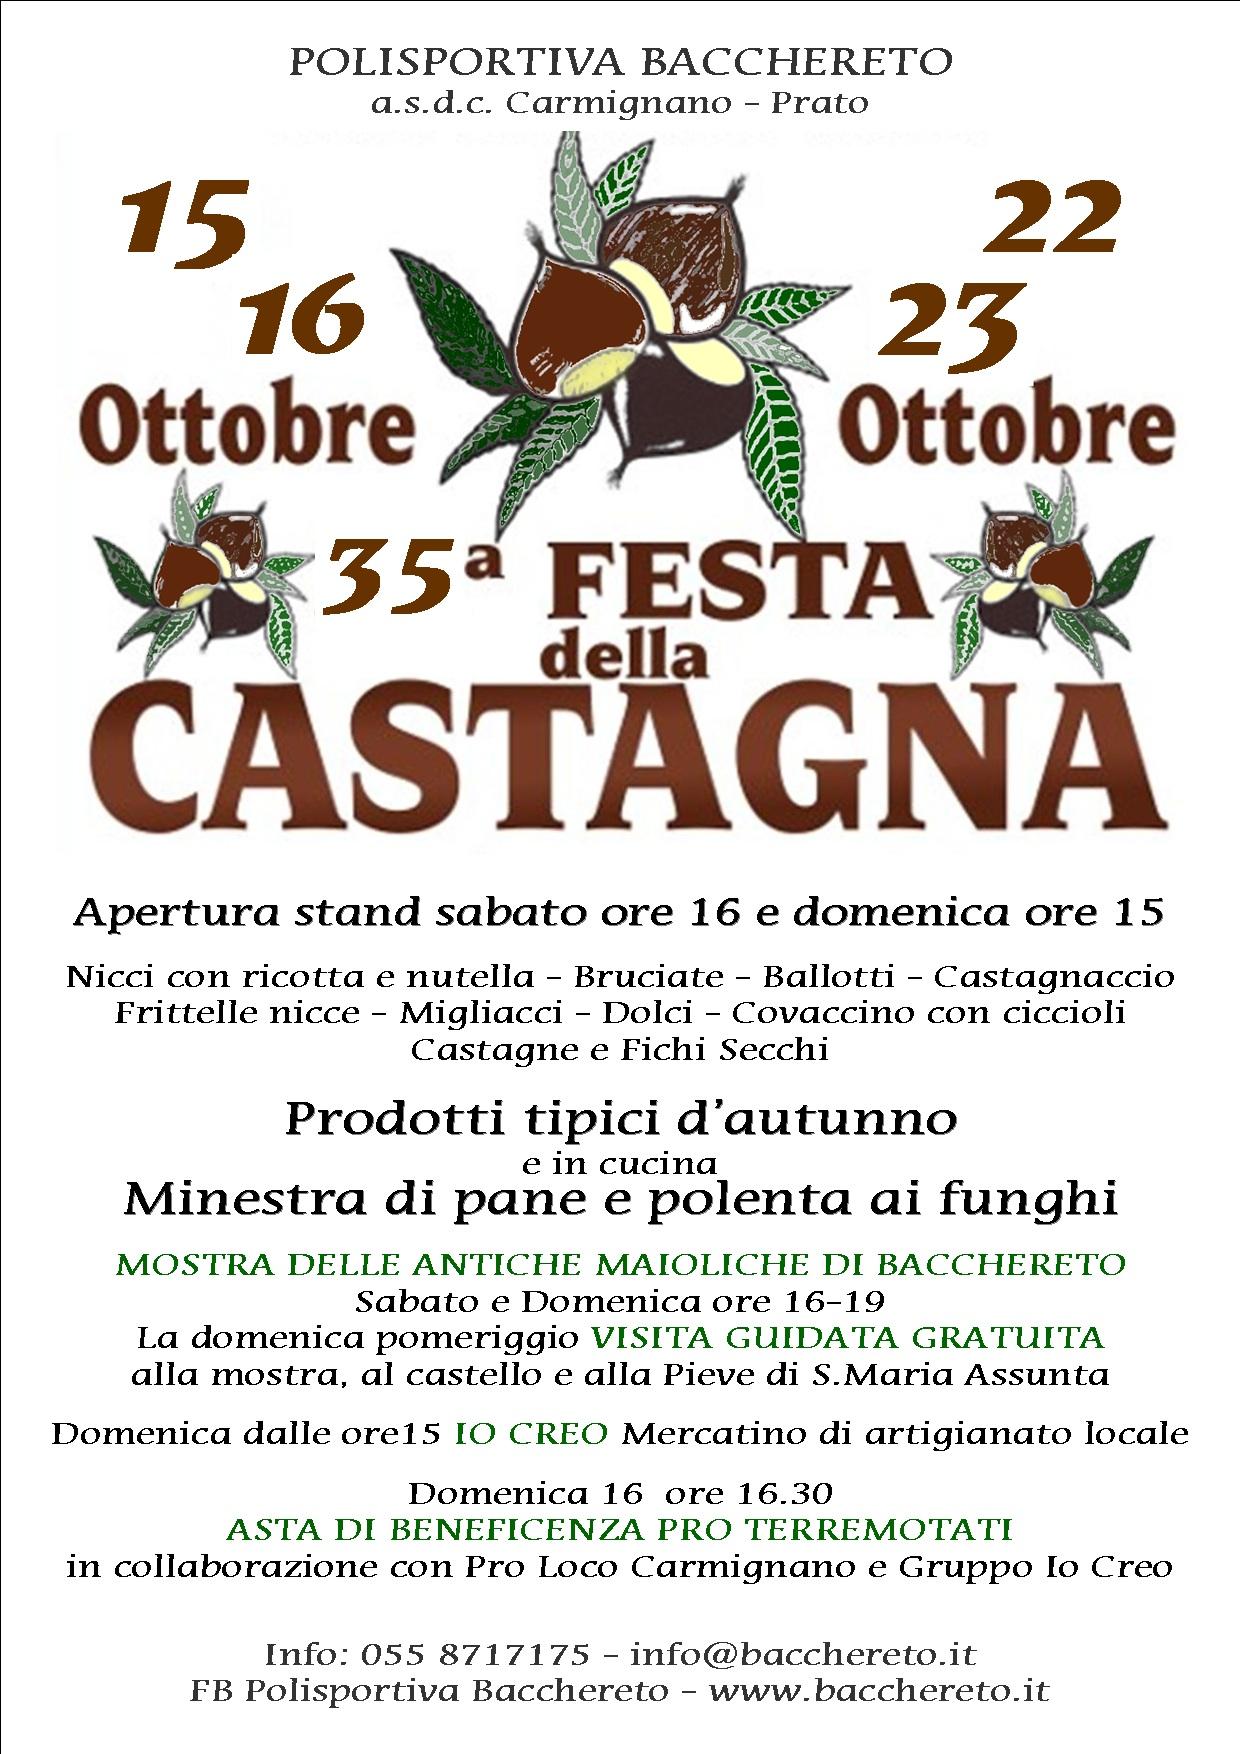 festa-castagna-bacchereto-eventiintoscana.it